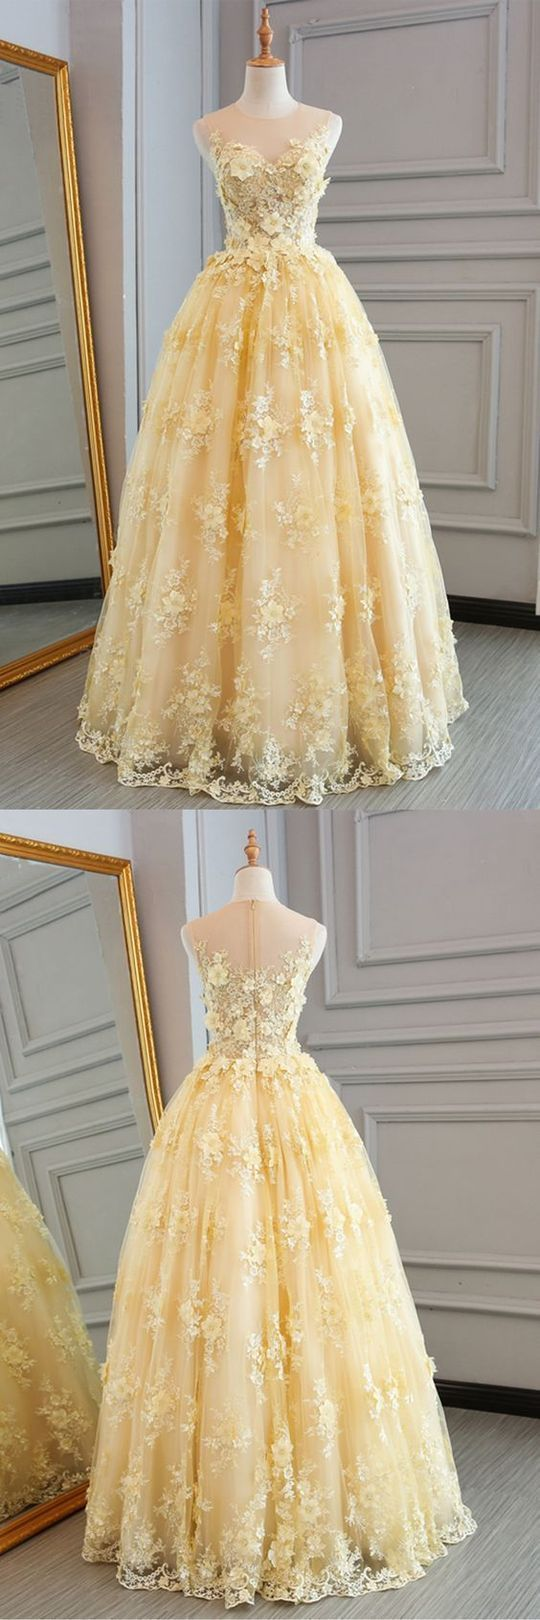 yellow applique wedding dress lace a-line long prom dress,HS20